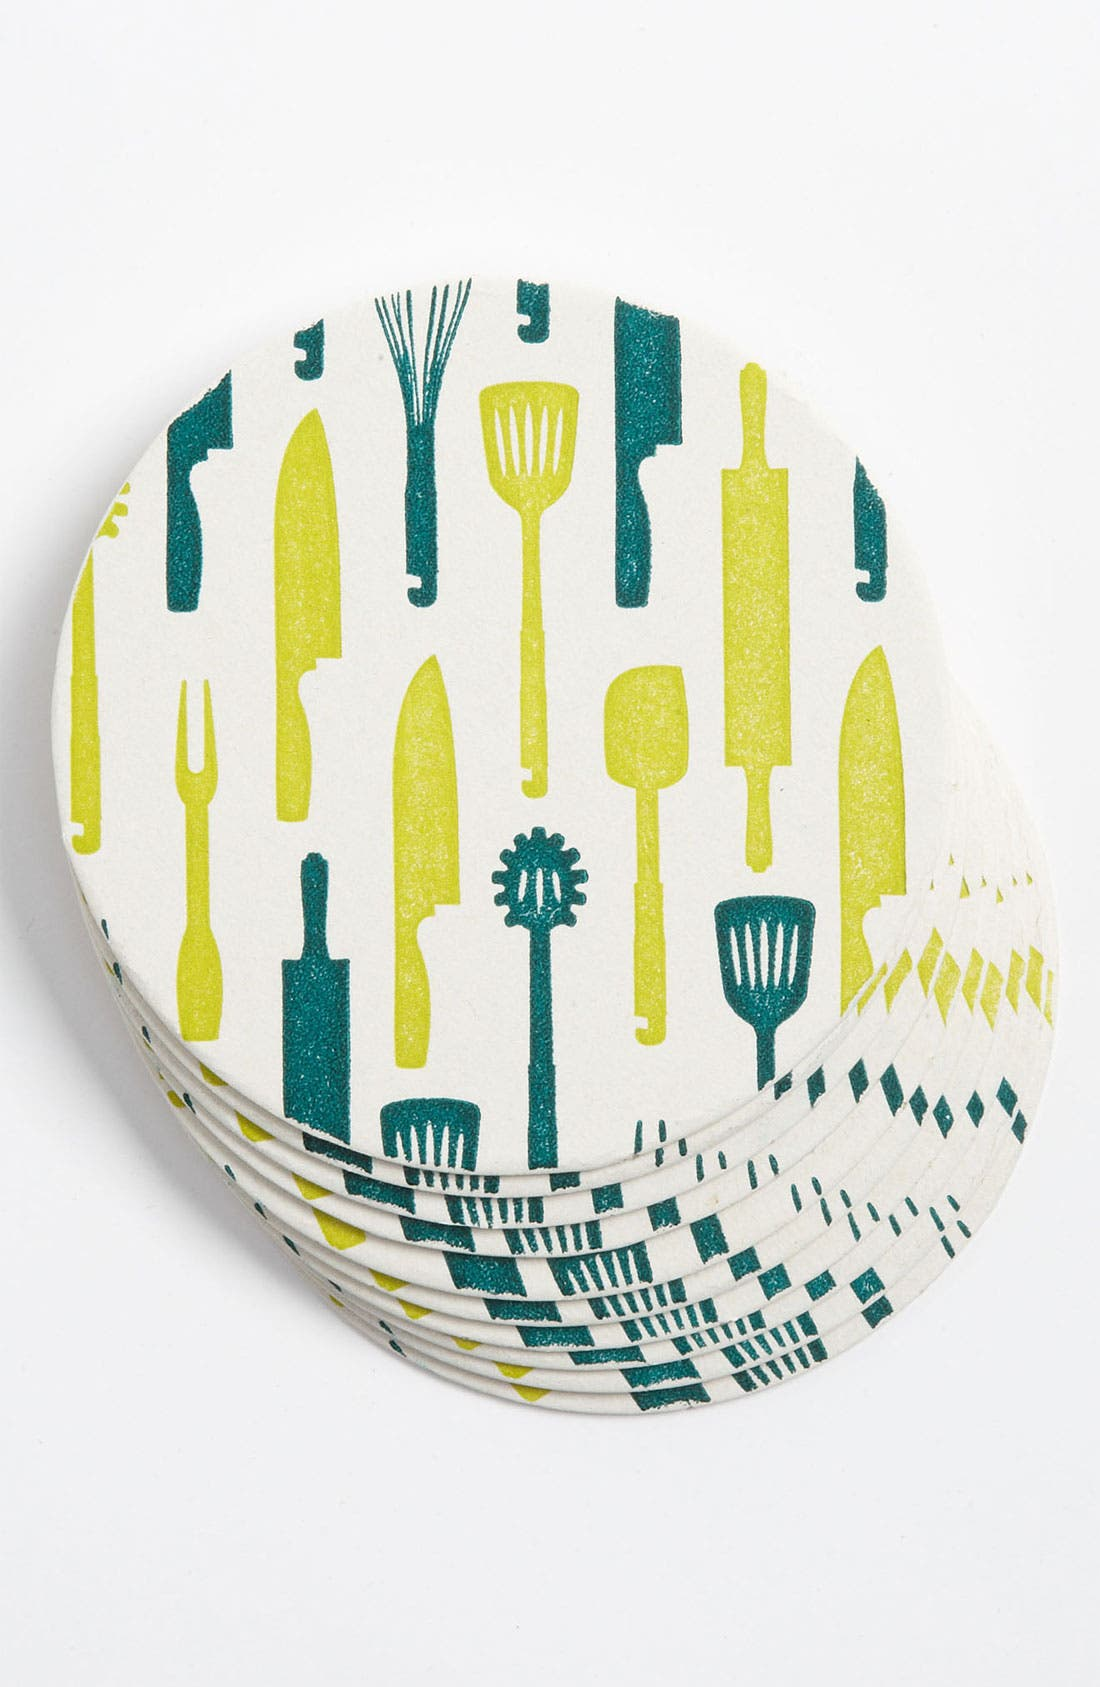 Main Image - 'Kitchen Utensils' Letterpress Coasters (Set of 10)